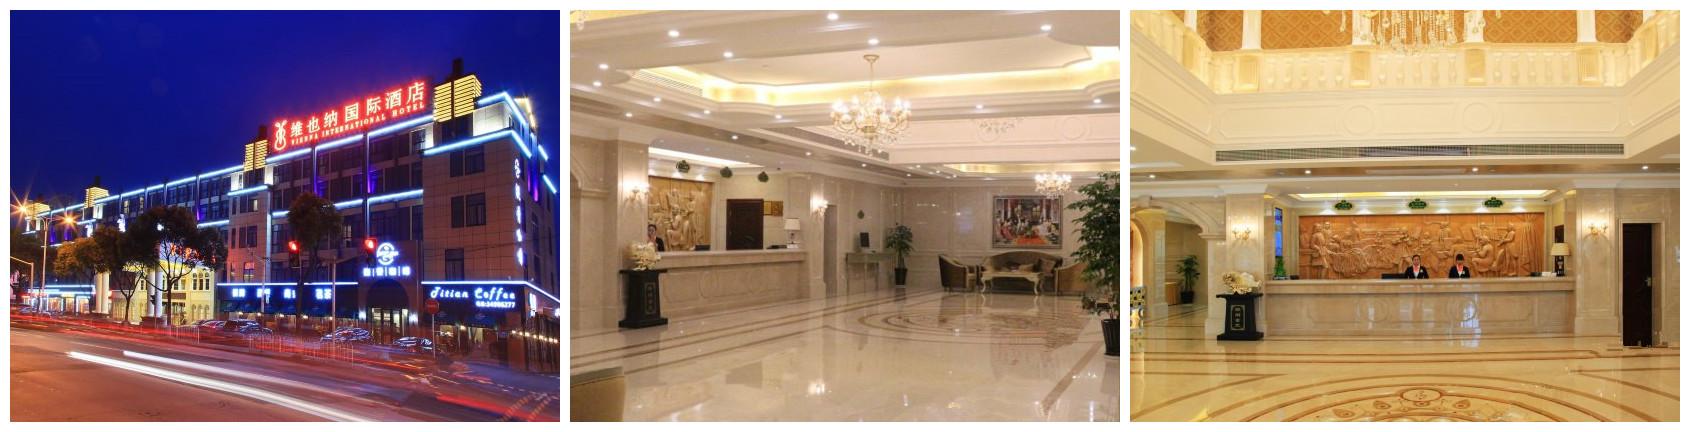 Chinaplas 2018 Hotel Reservation